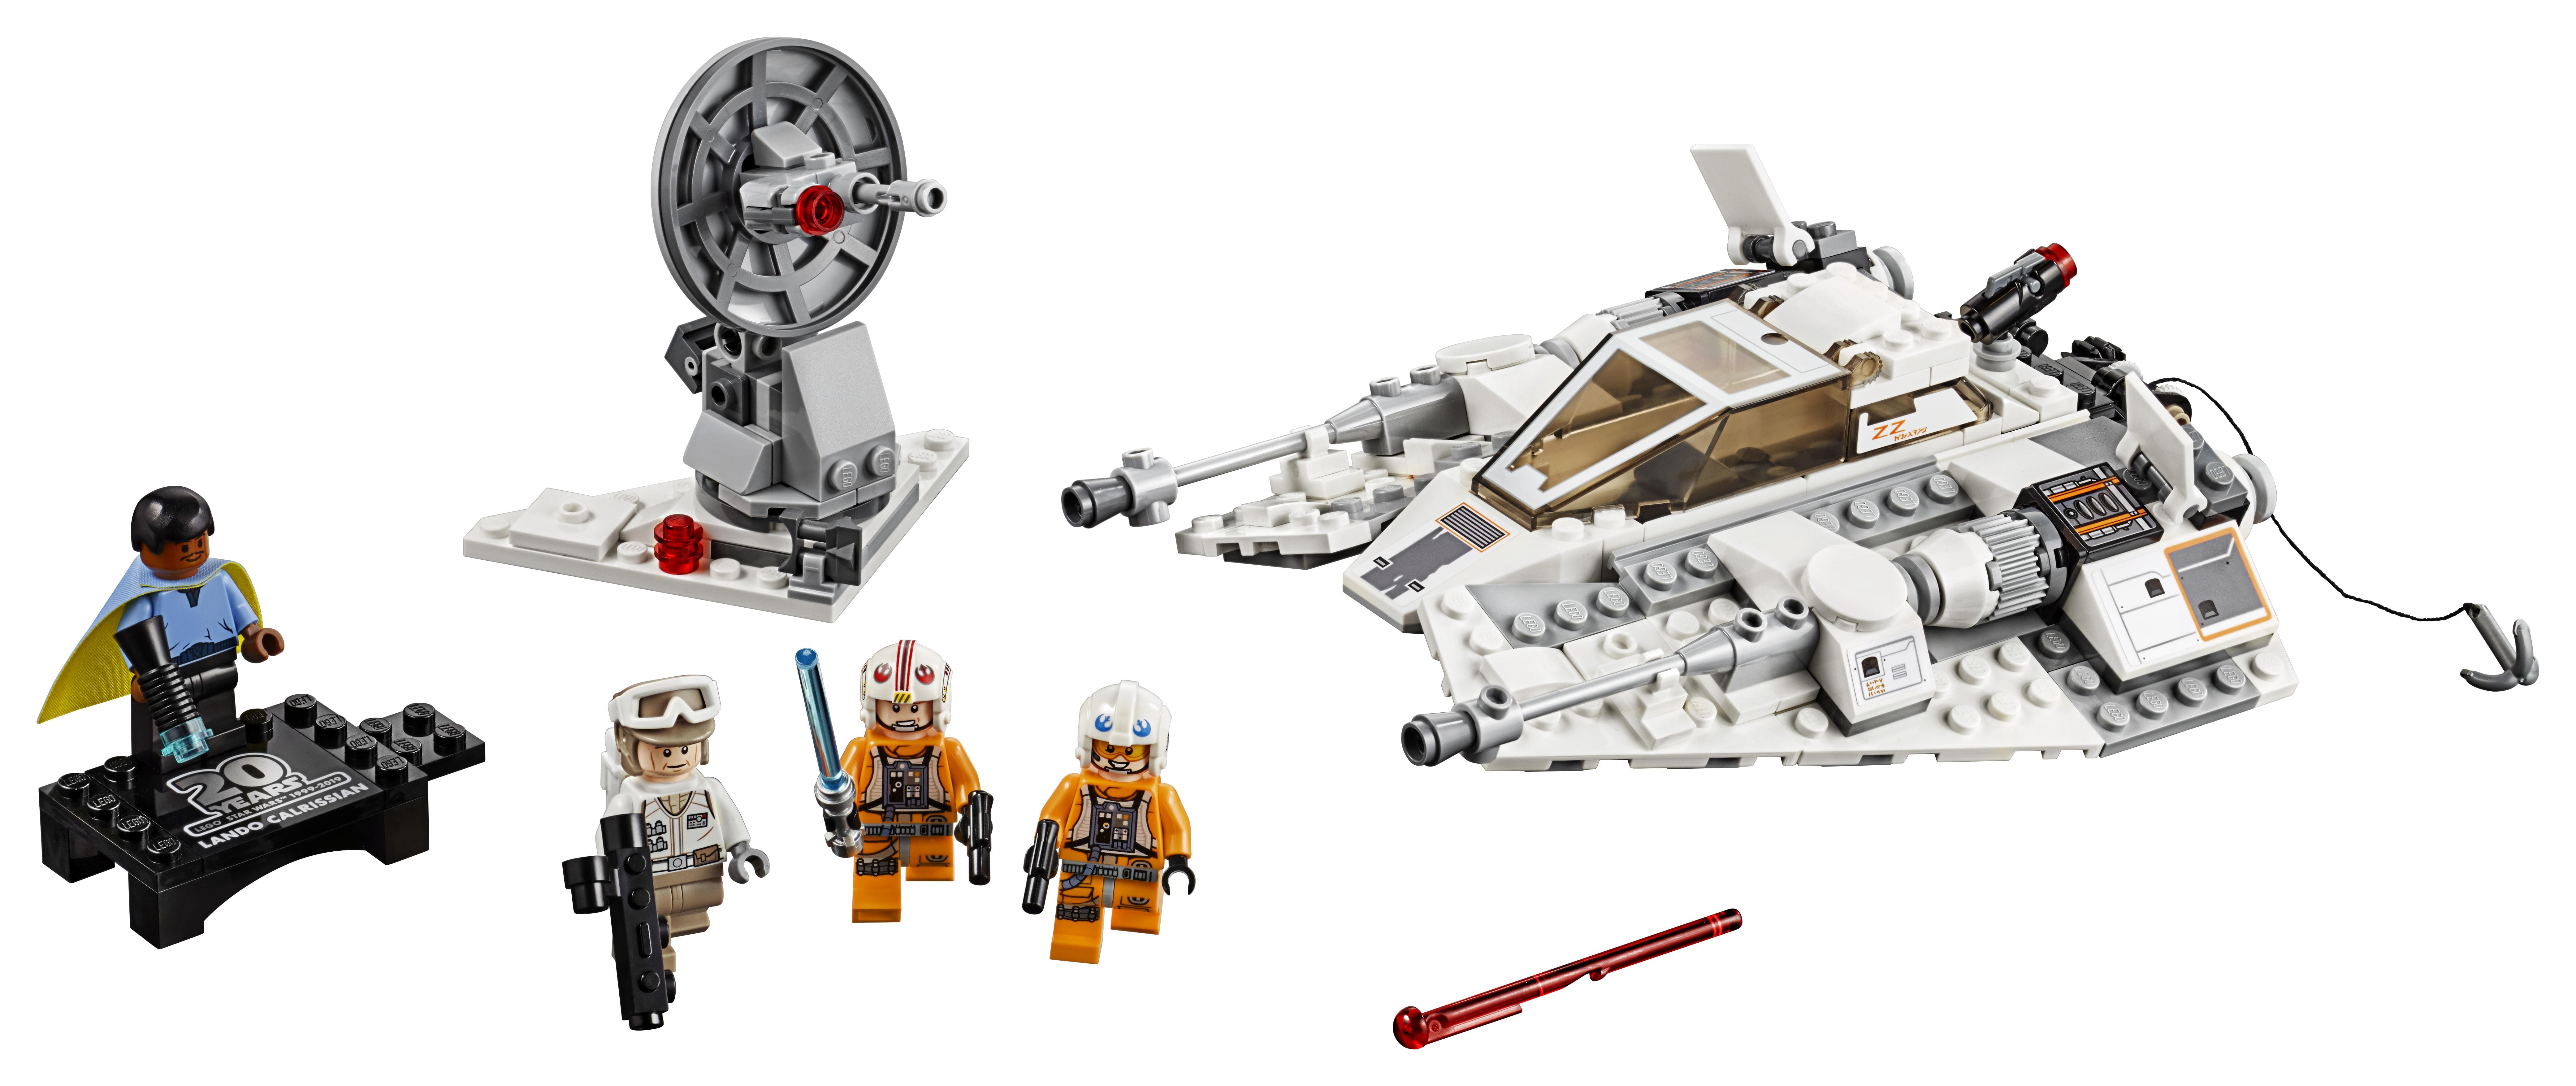 LEGO Star Wars: The Empire Strikes Back Snowspeeder – 20th Anniversary Edition